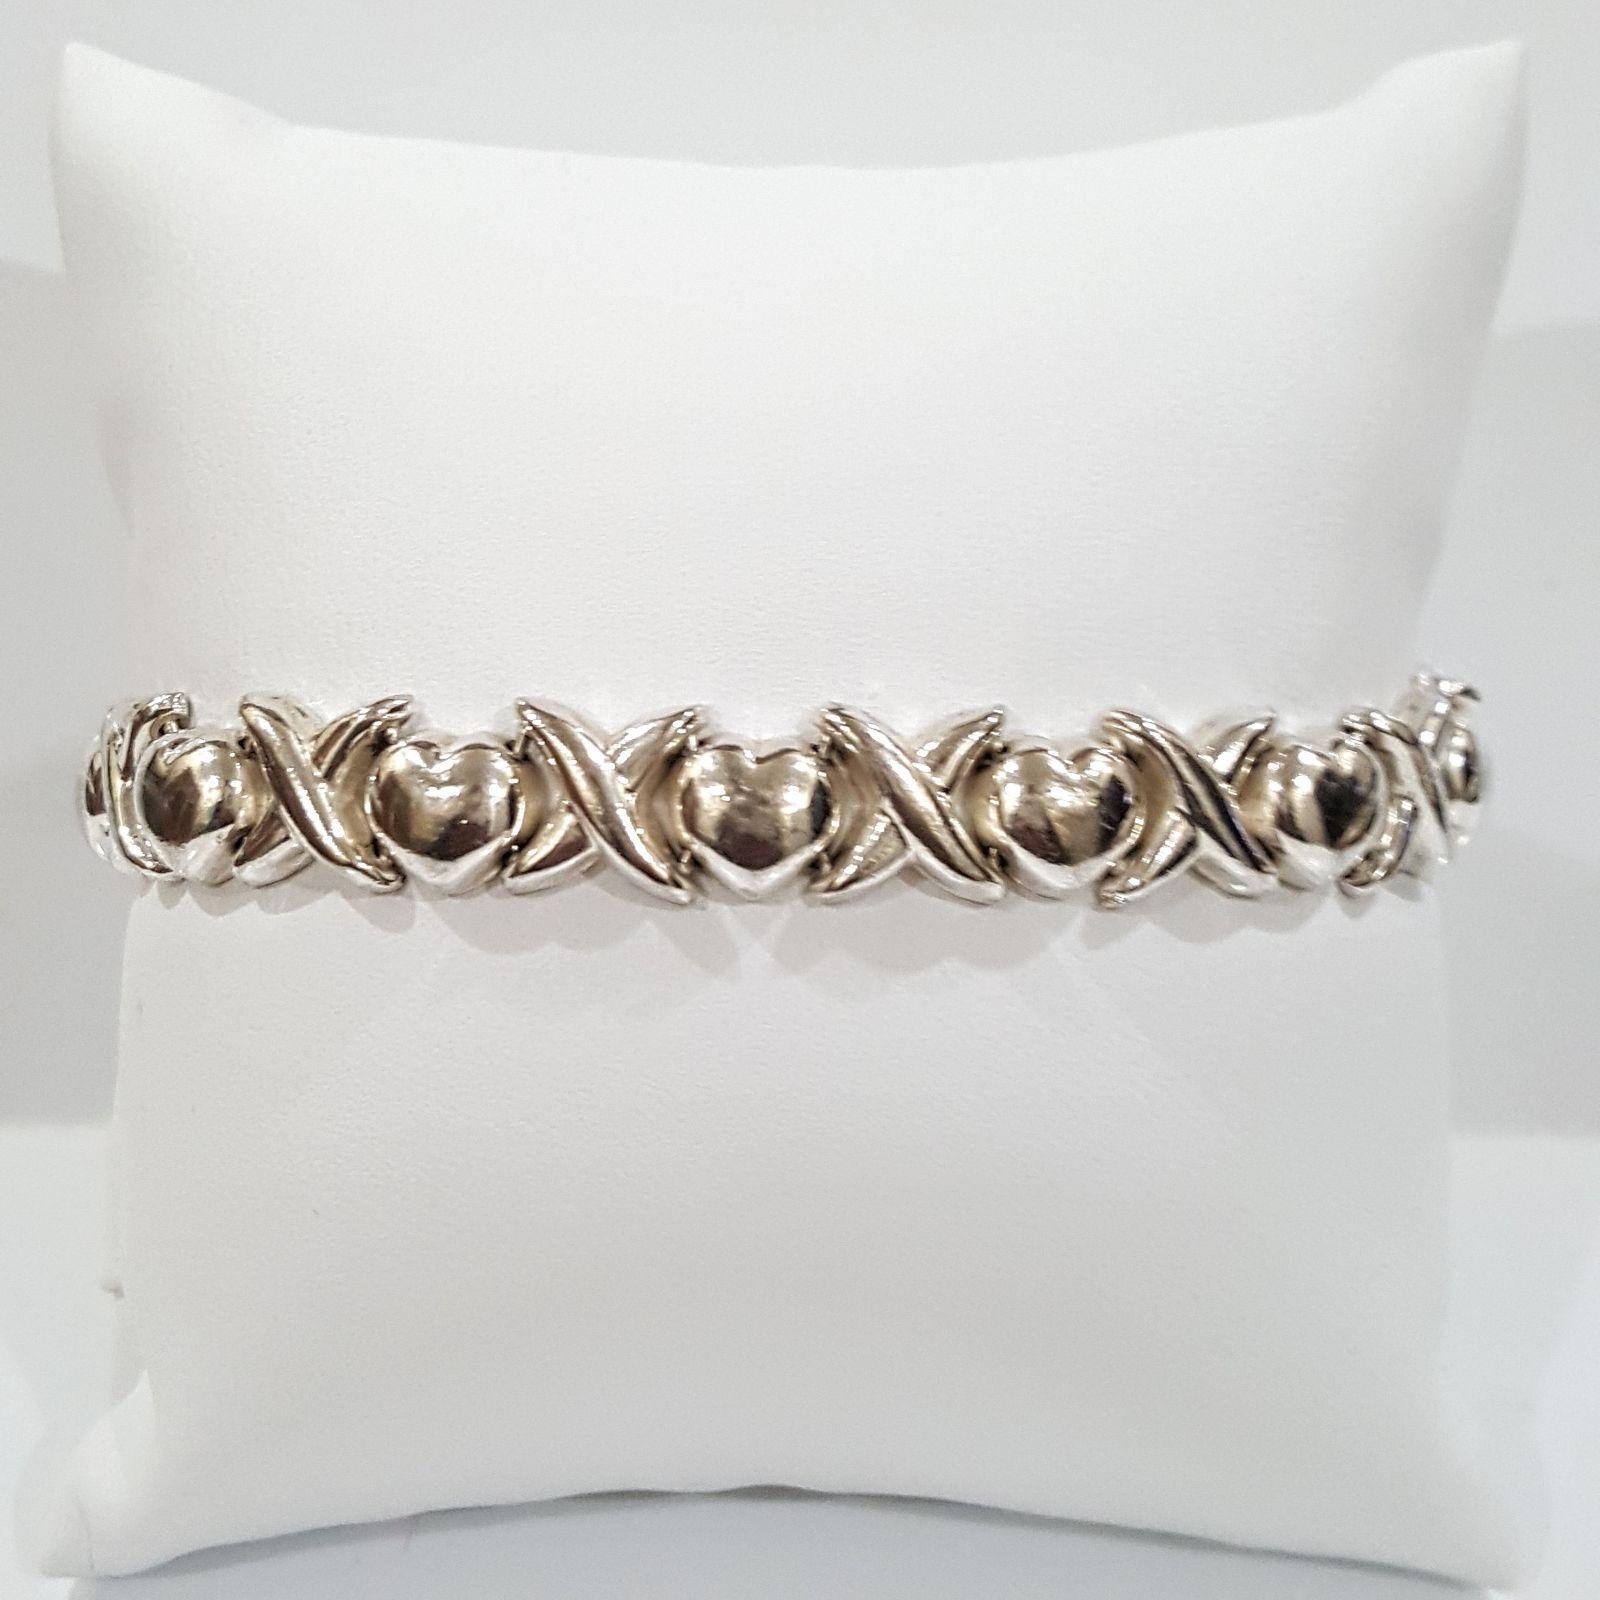 925 silver bracelets with burnished finish